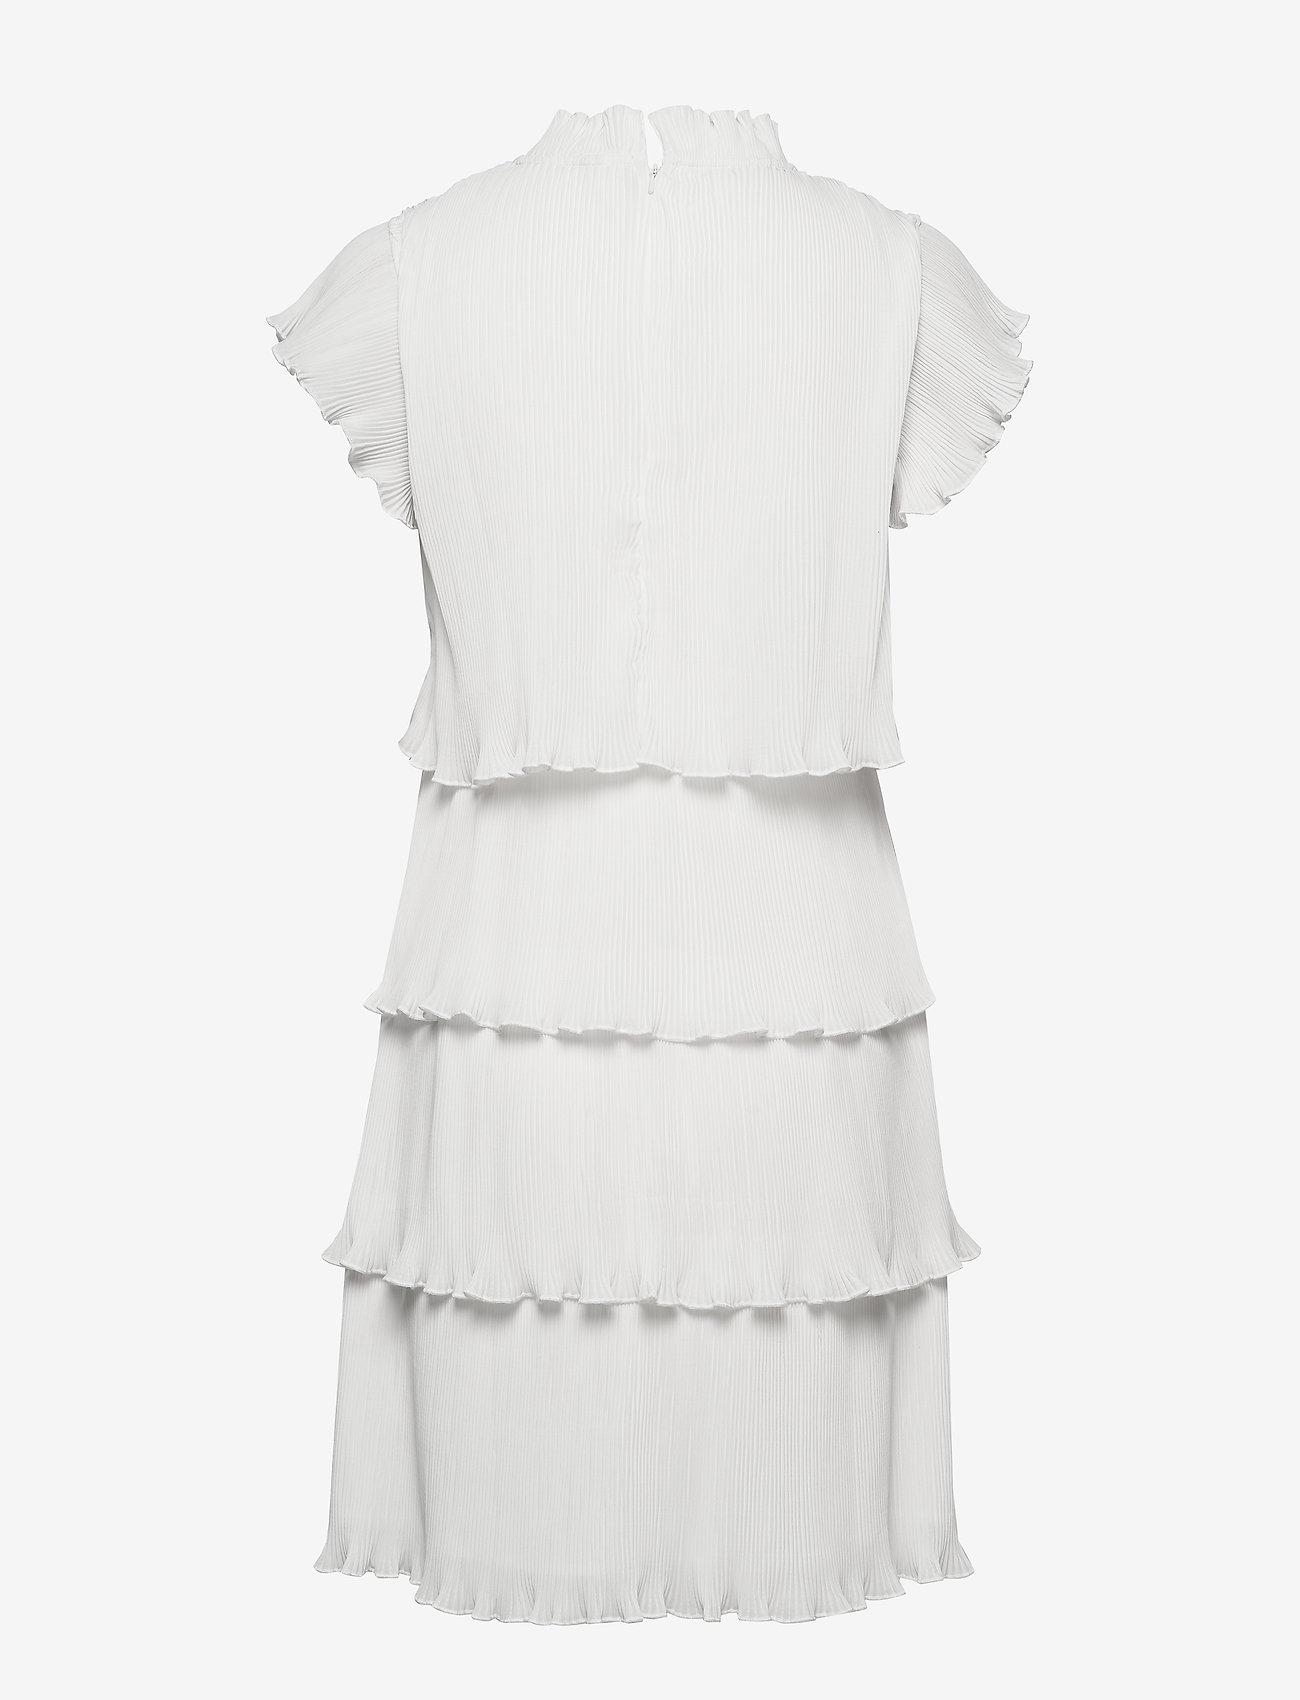 Yas Yasuma Ss Short Dress D2d - Dresses